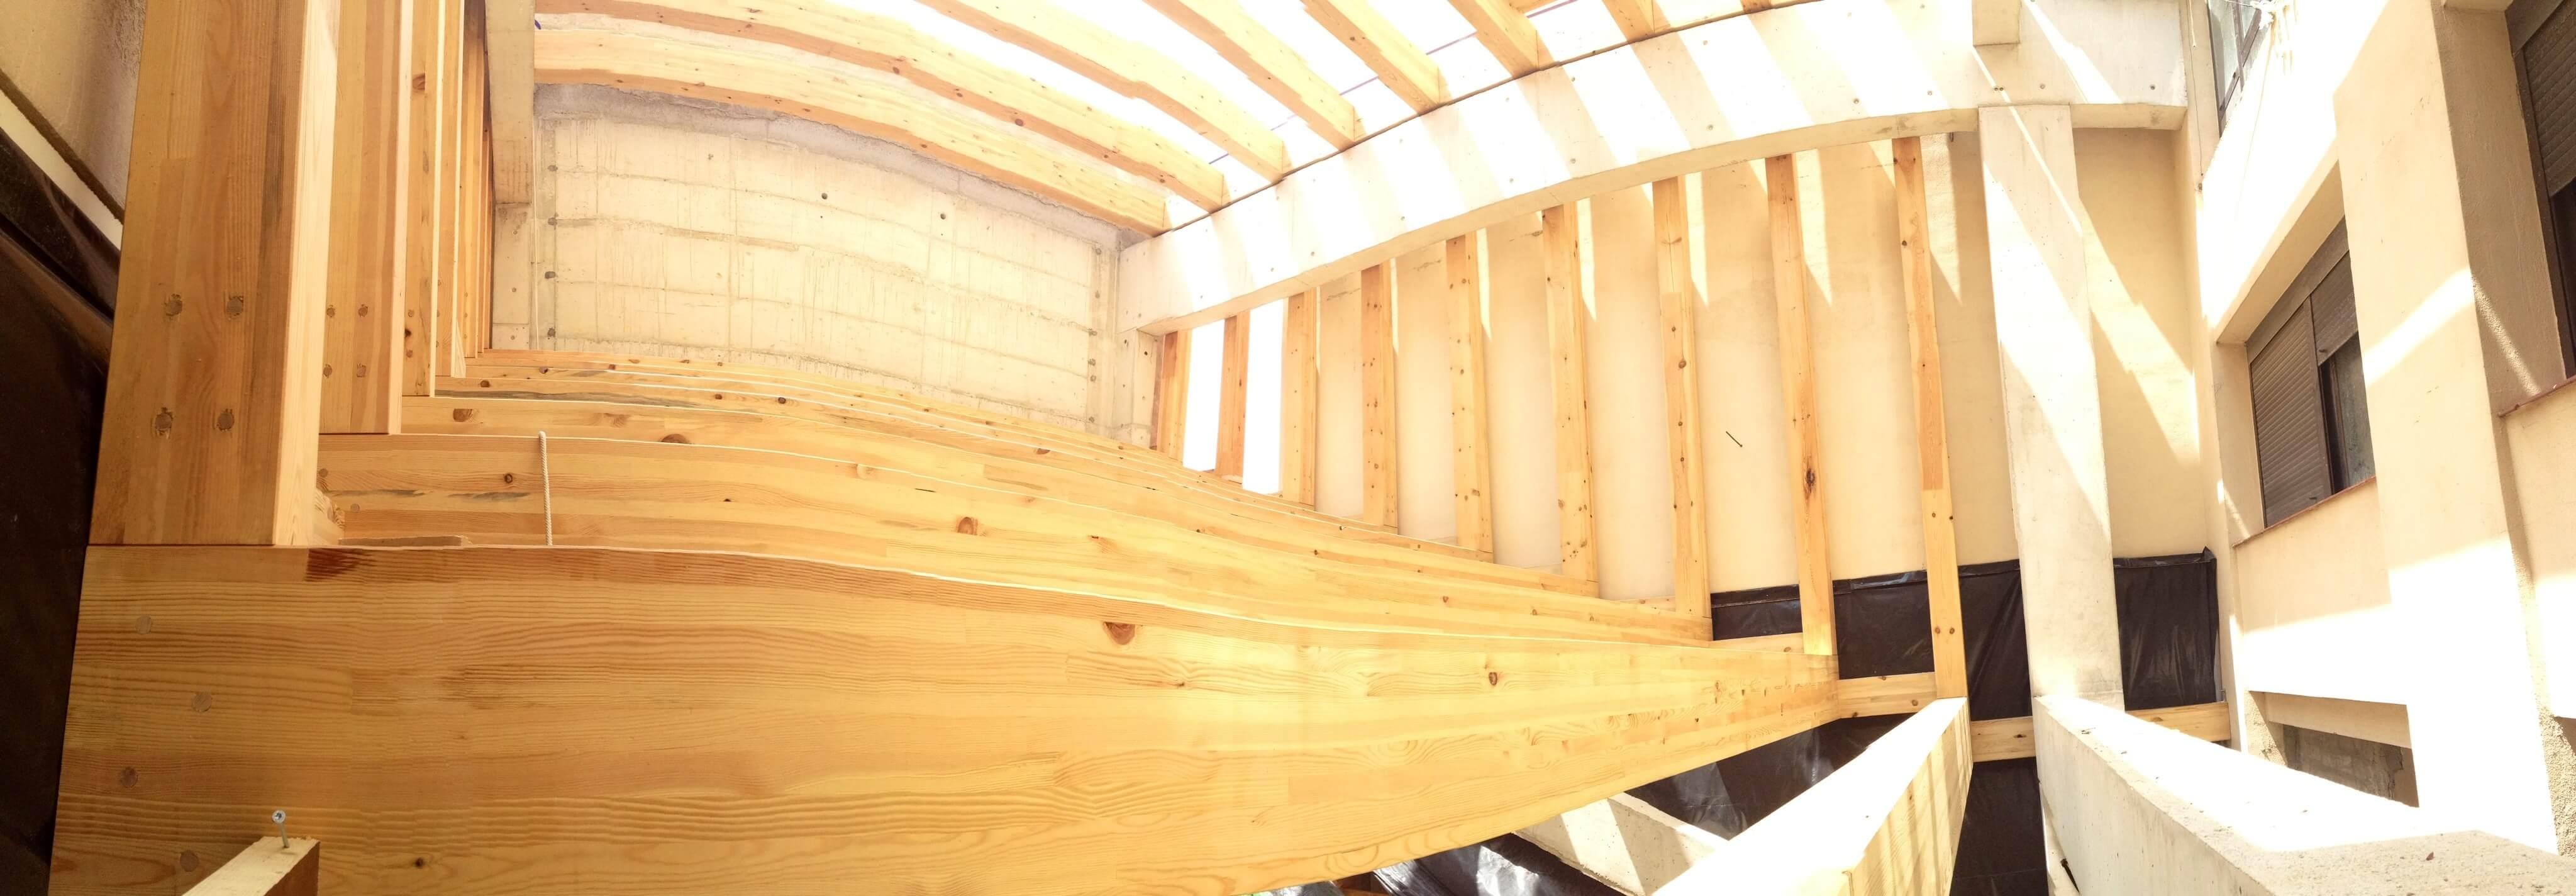 capilla de madera